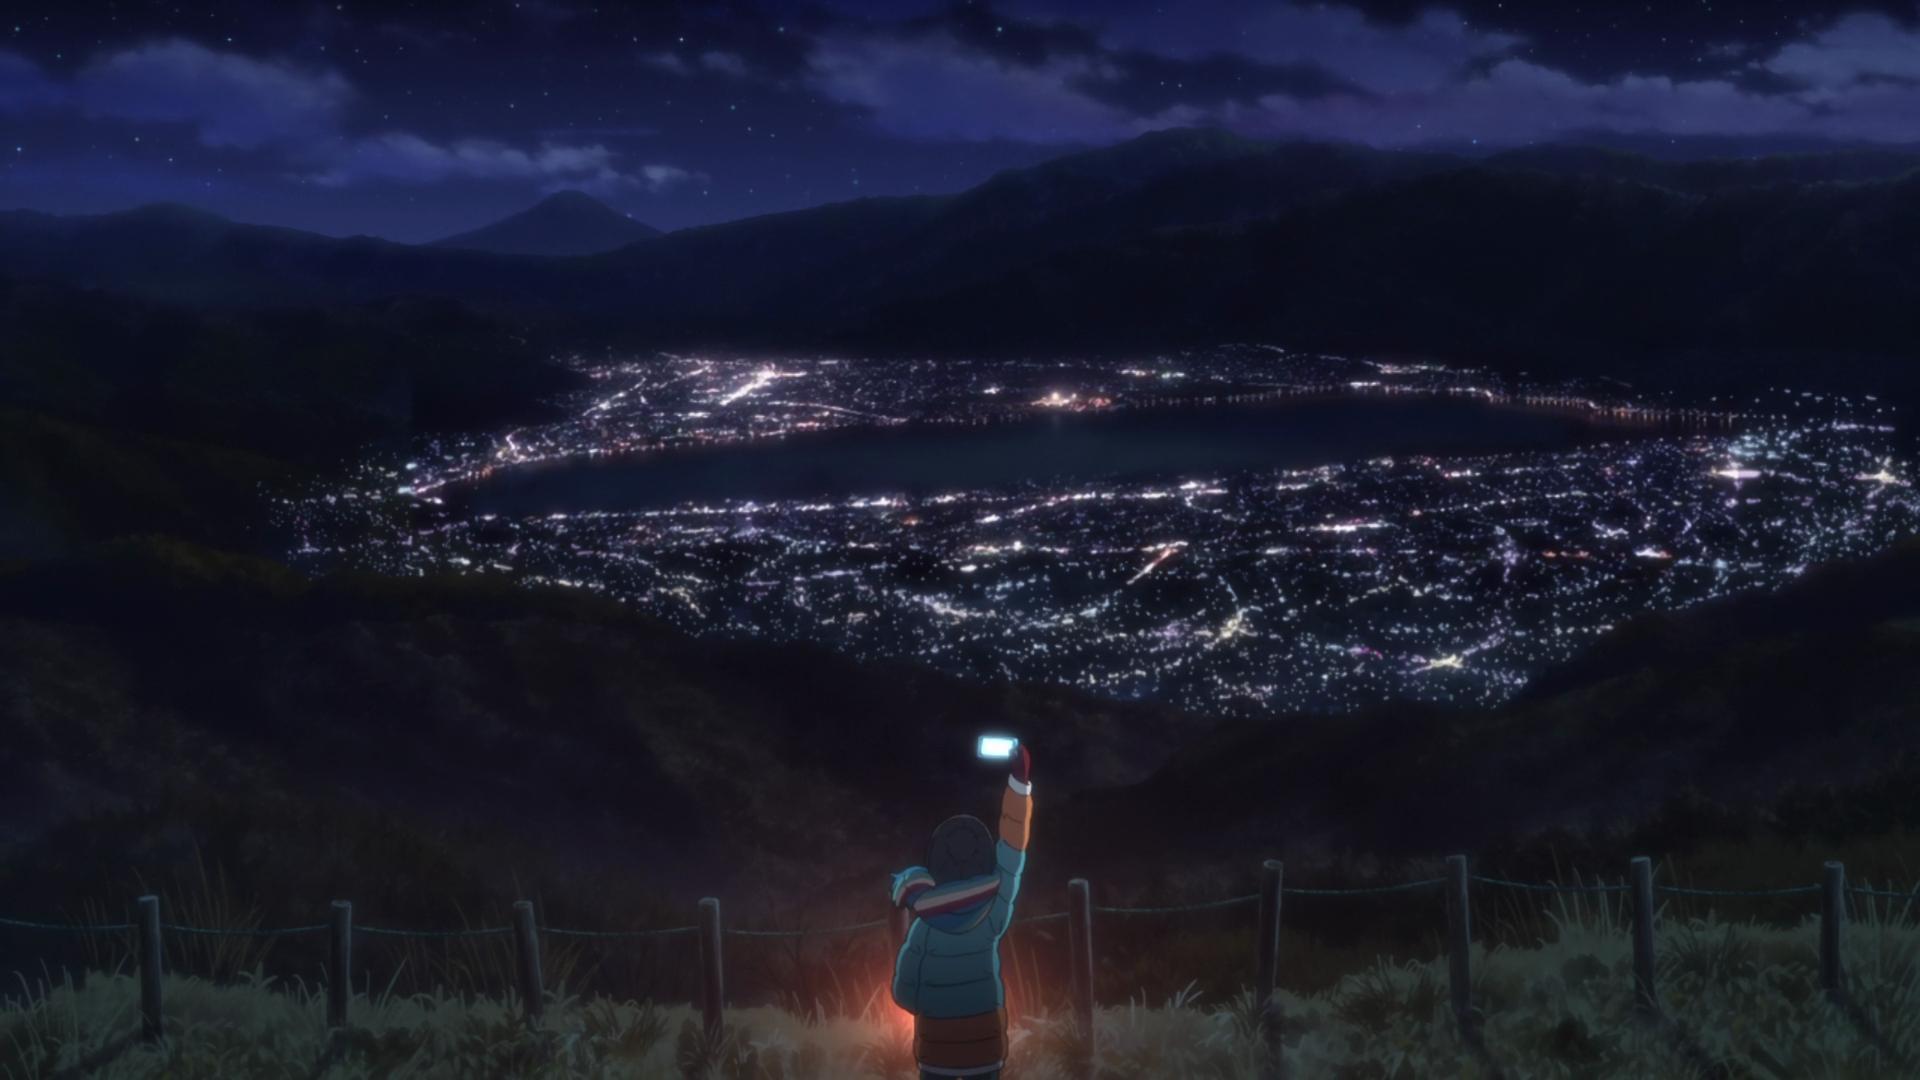 Fantastis 23+ Wallpaper Anime Night